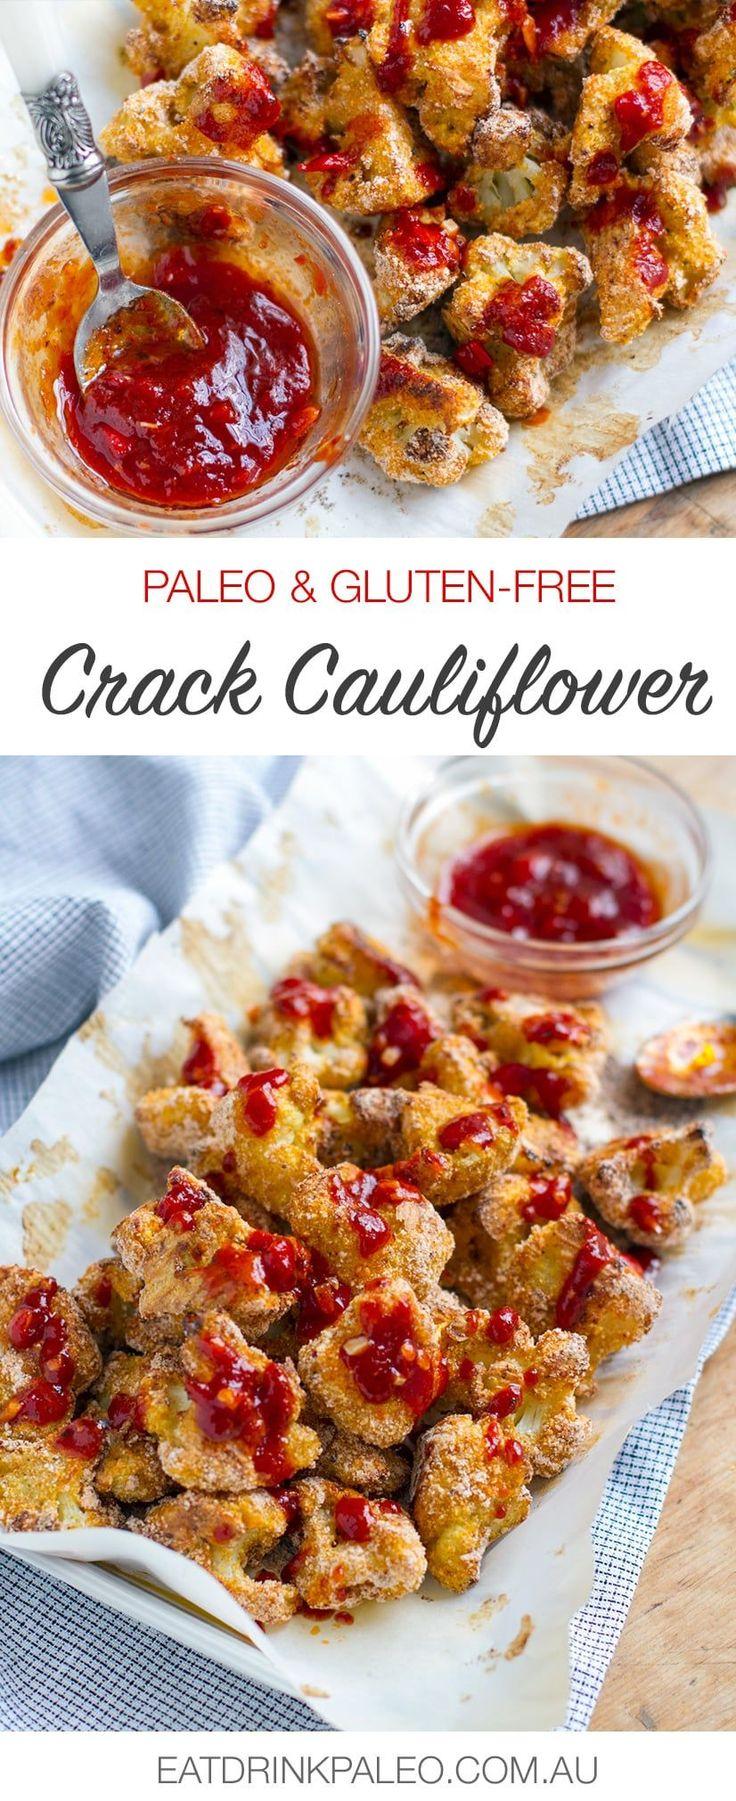 Crack Cauliflower With Fiery Red Sauce - Paleo & Gluten-Free Recipe